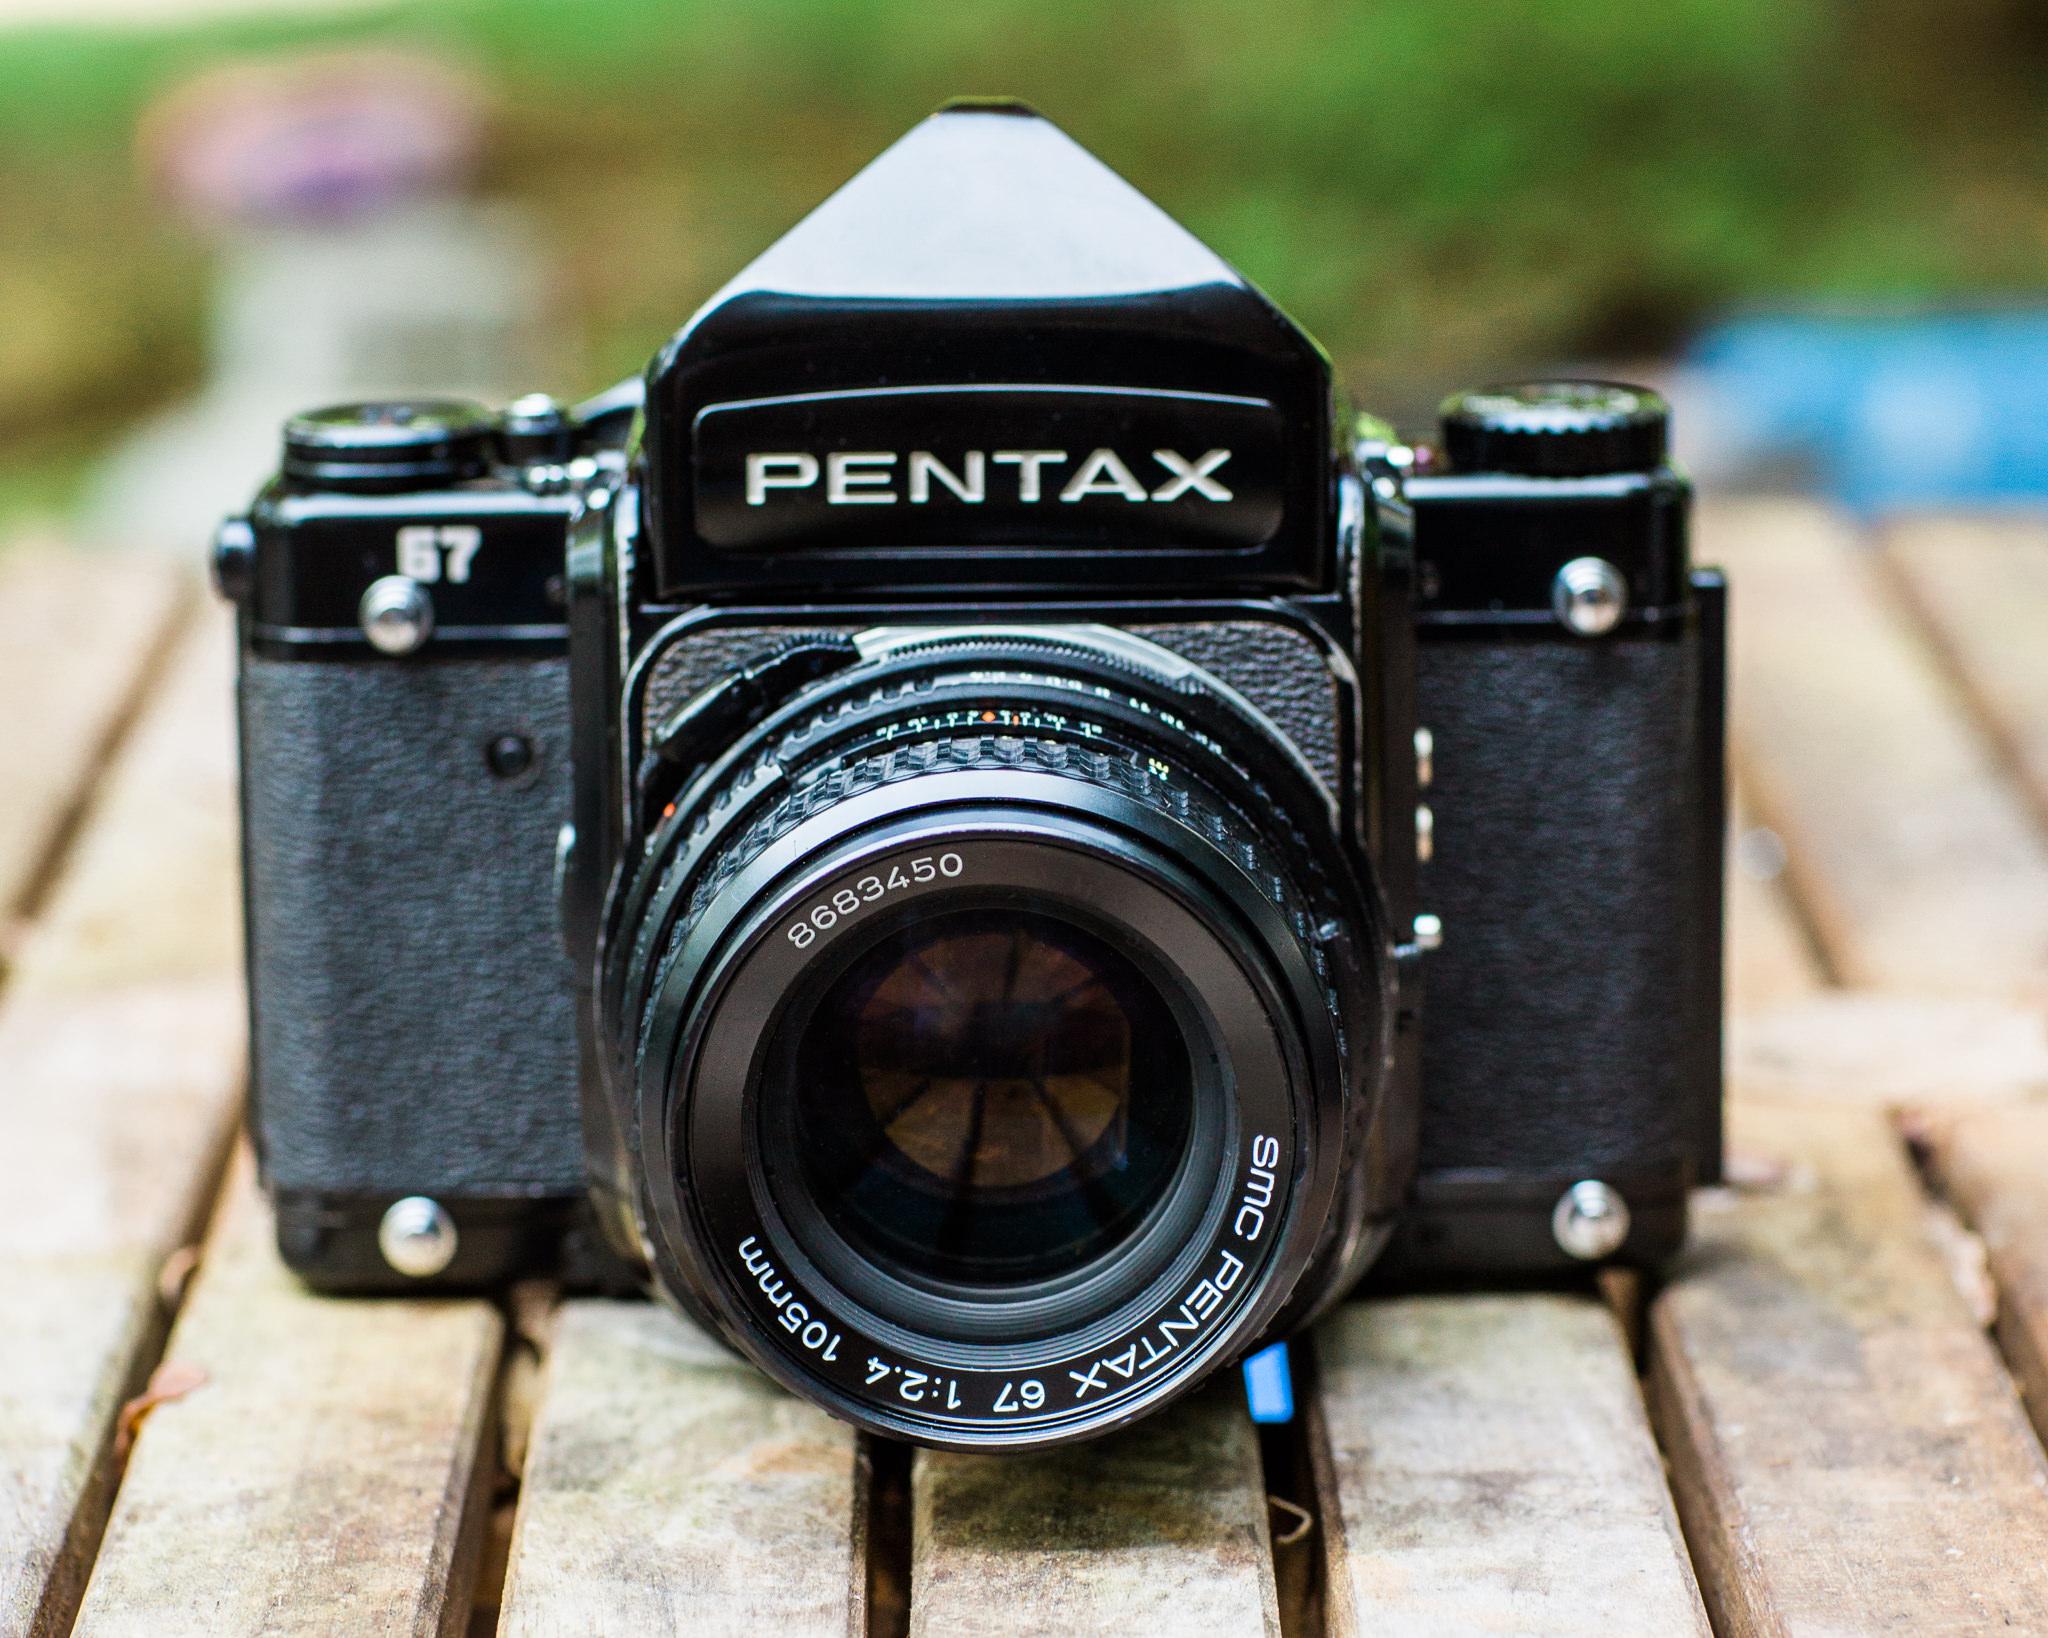 Pentax 67  Medium Format Film Camera with the Pentax 67 SMC 105mm f/2.4 Lens